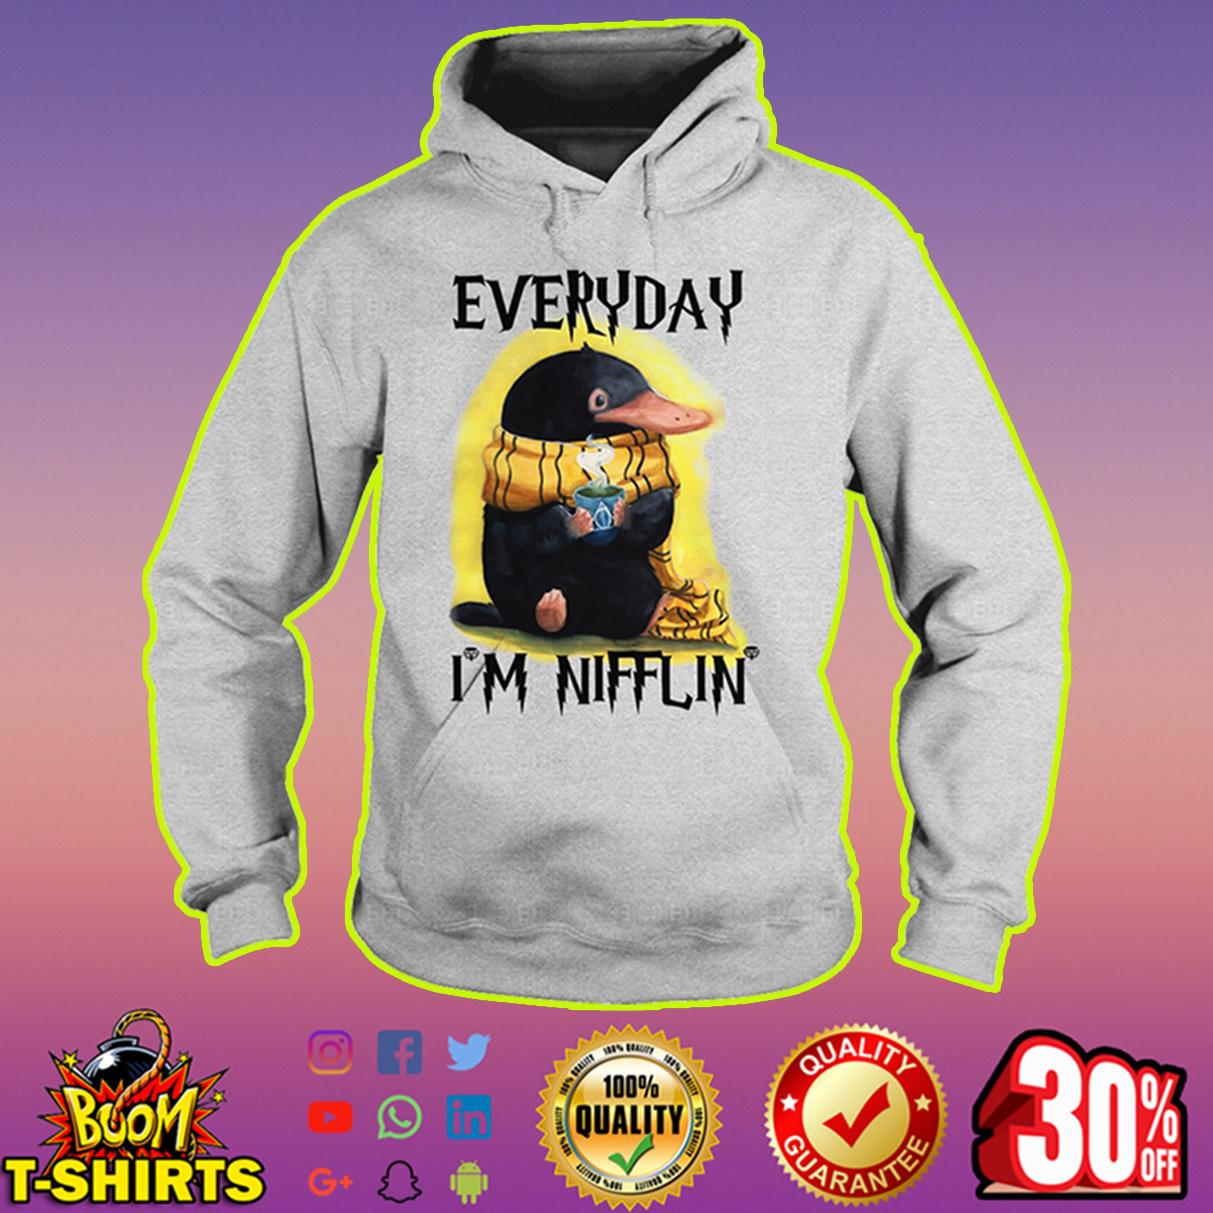 Everyday I'm nifflin' hoodie